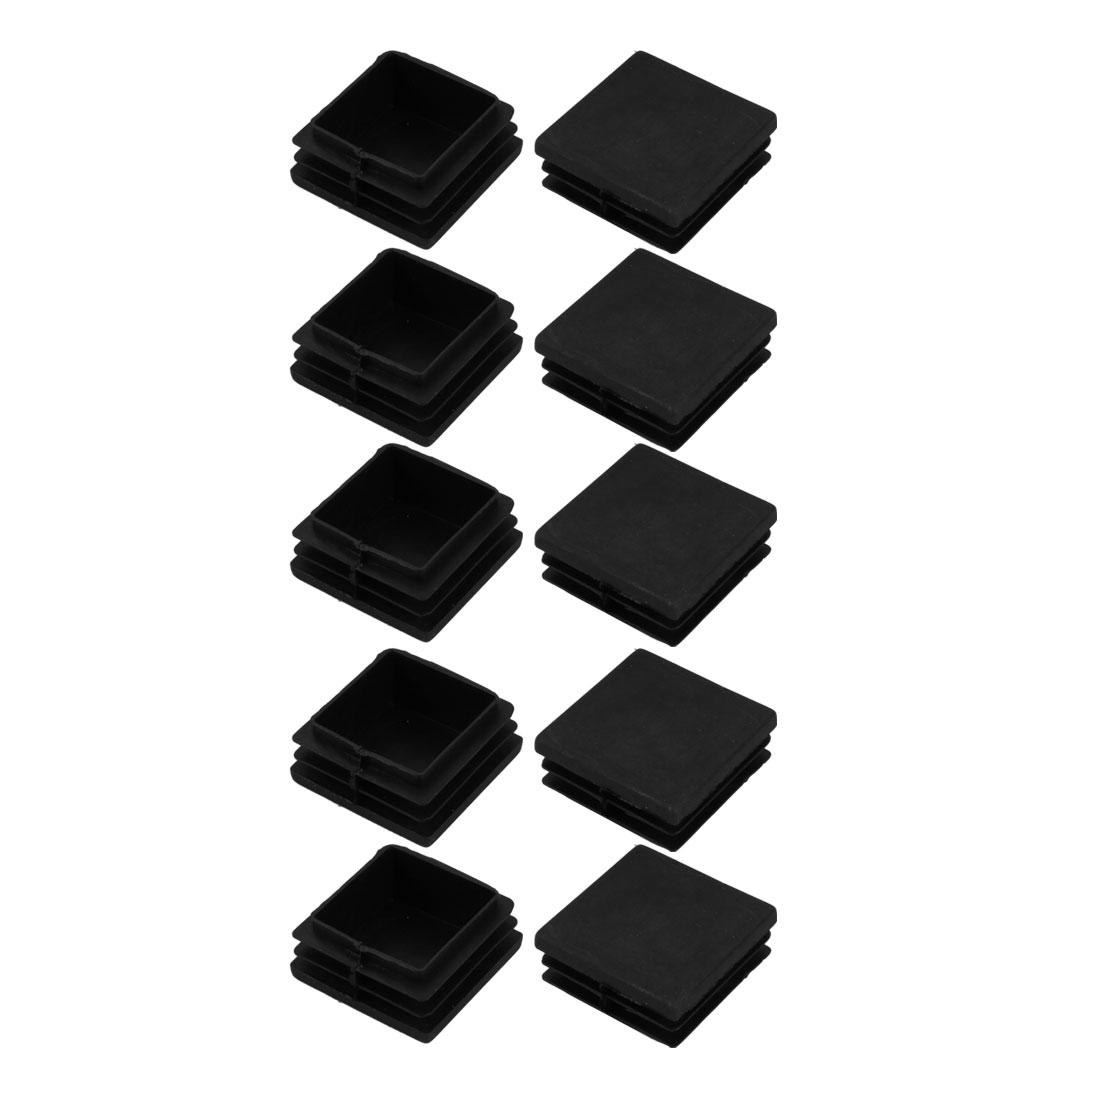 10pcs 40mmX40mm Pipe Tube Insert Chair Leg Cap Square Black Plastic Tubing Plug